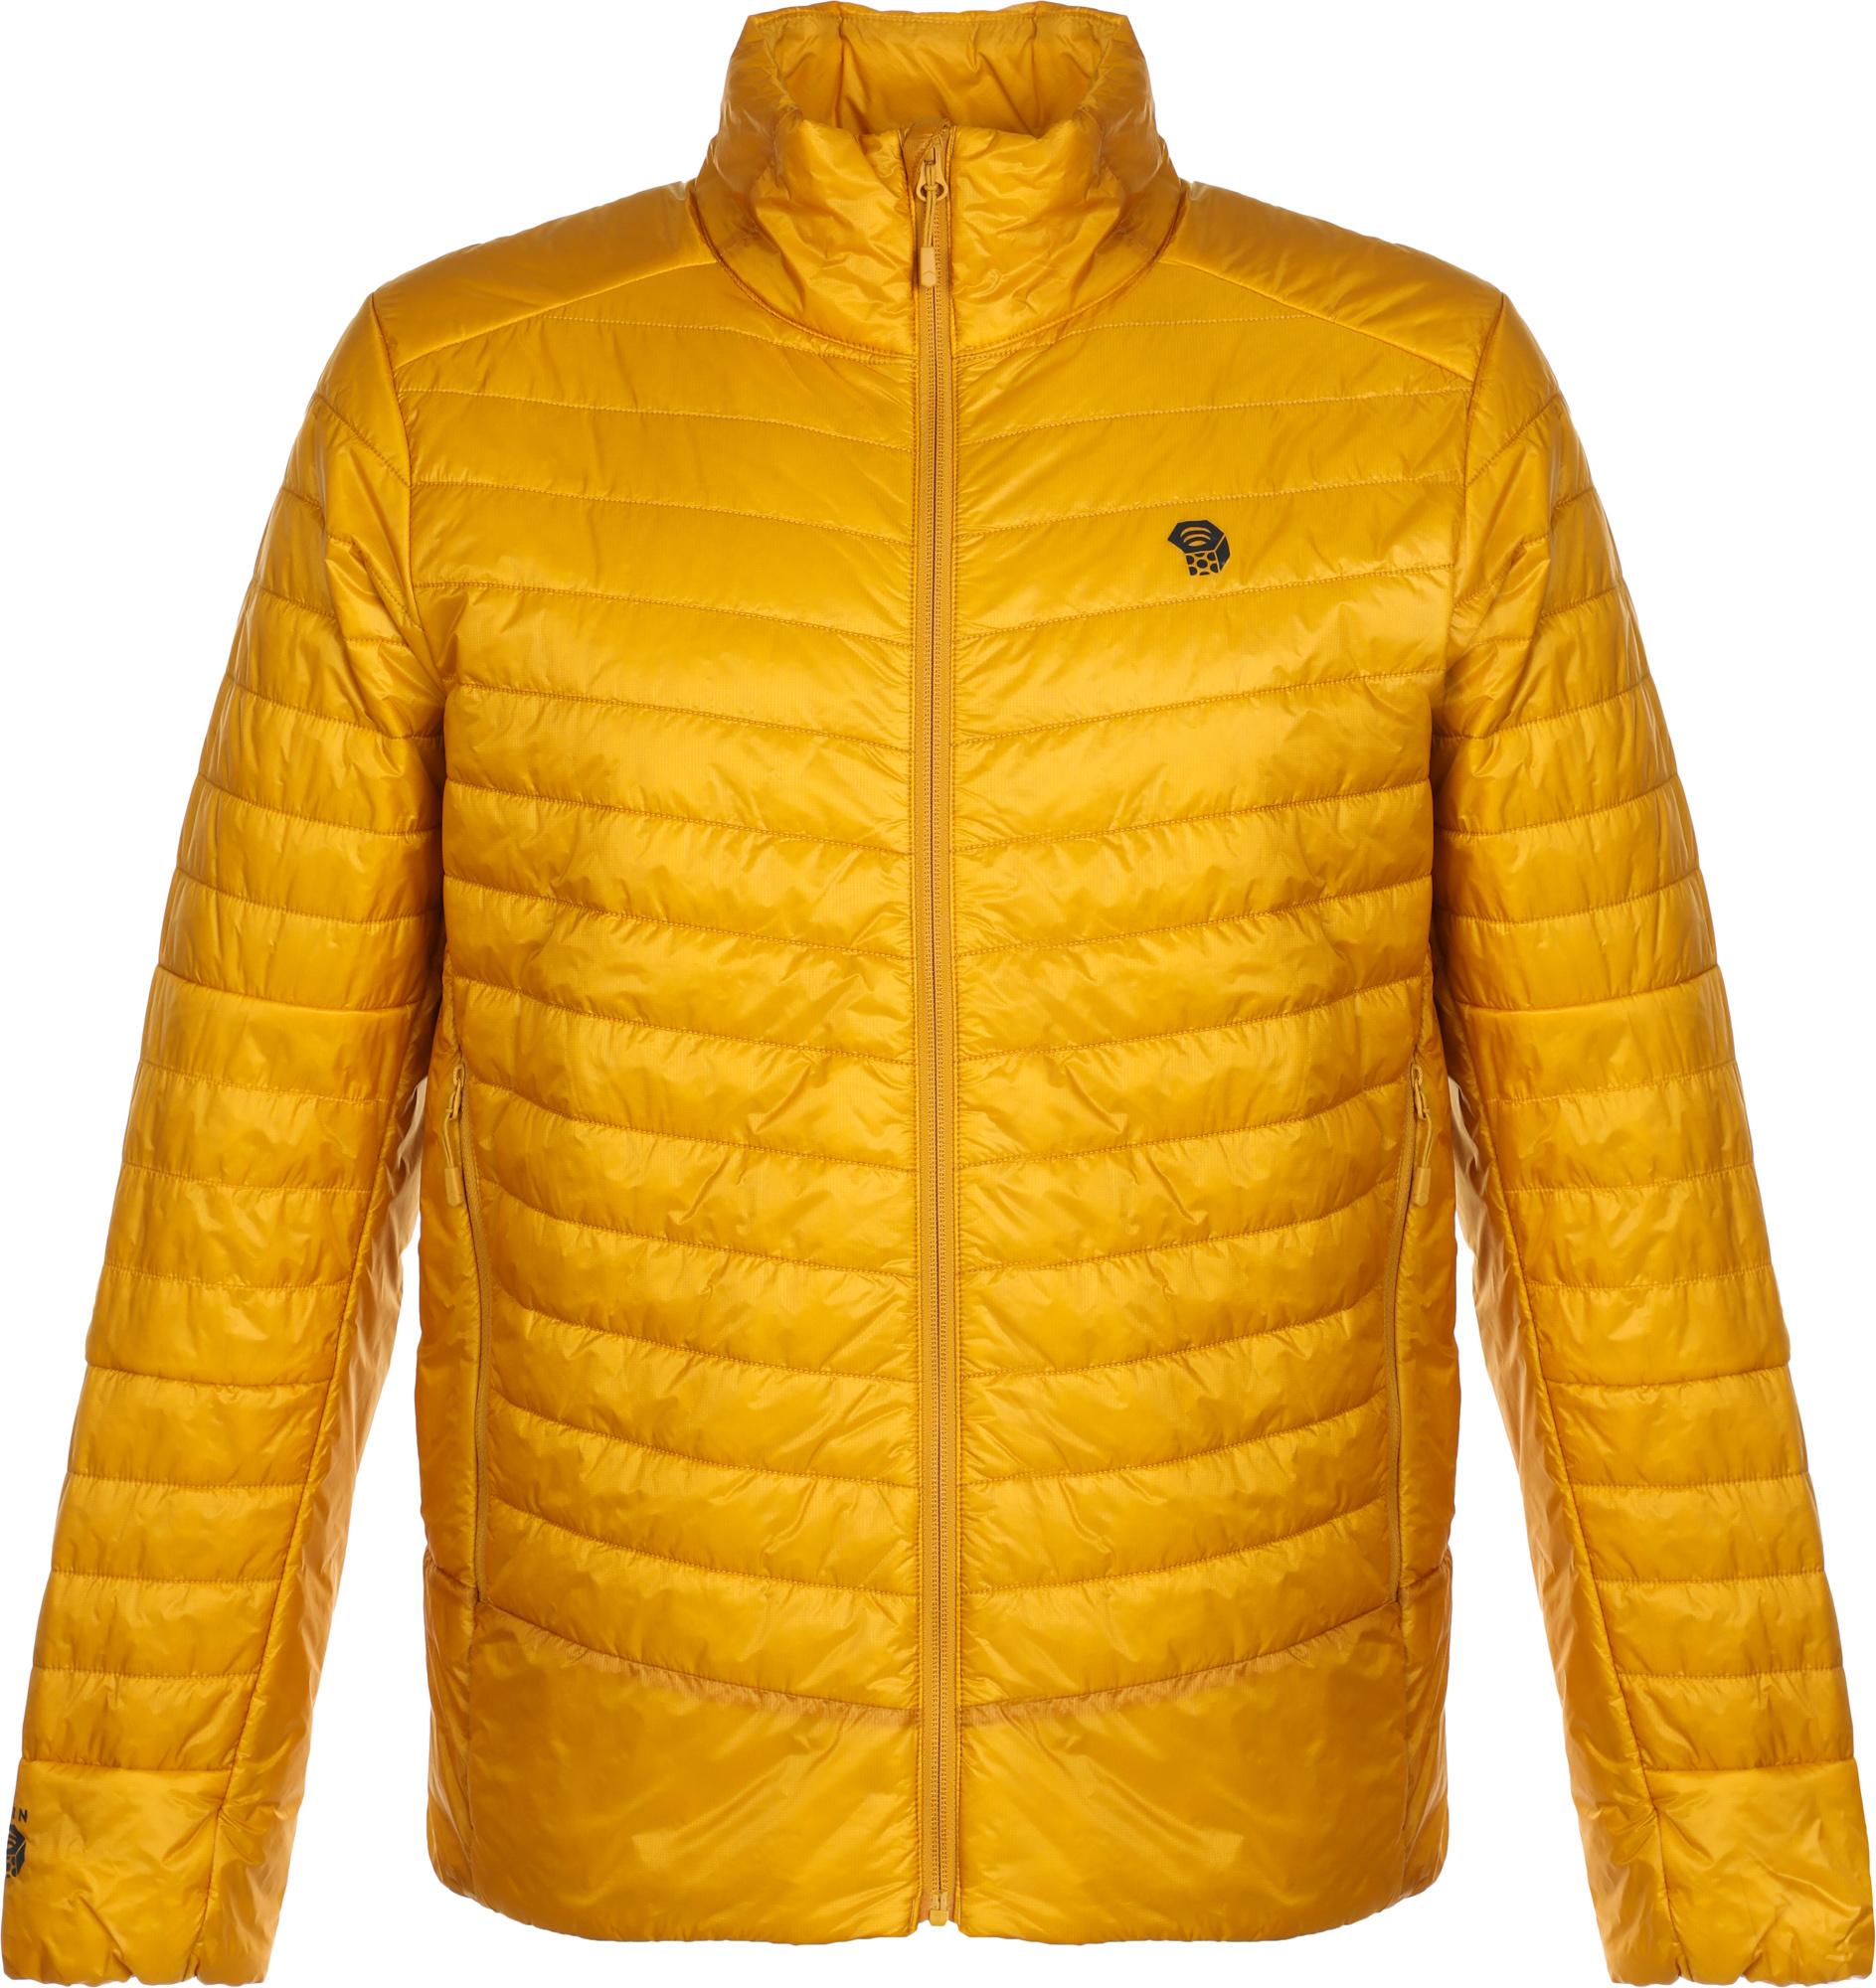 Mountain Hardwear Куртка утепленная мужская Mountain Hardwear Ghost Shadow™, размер 52 mountain hardwear куртка утепленная мужская mountain hardwear ghost shadow™ размер 56